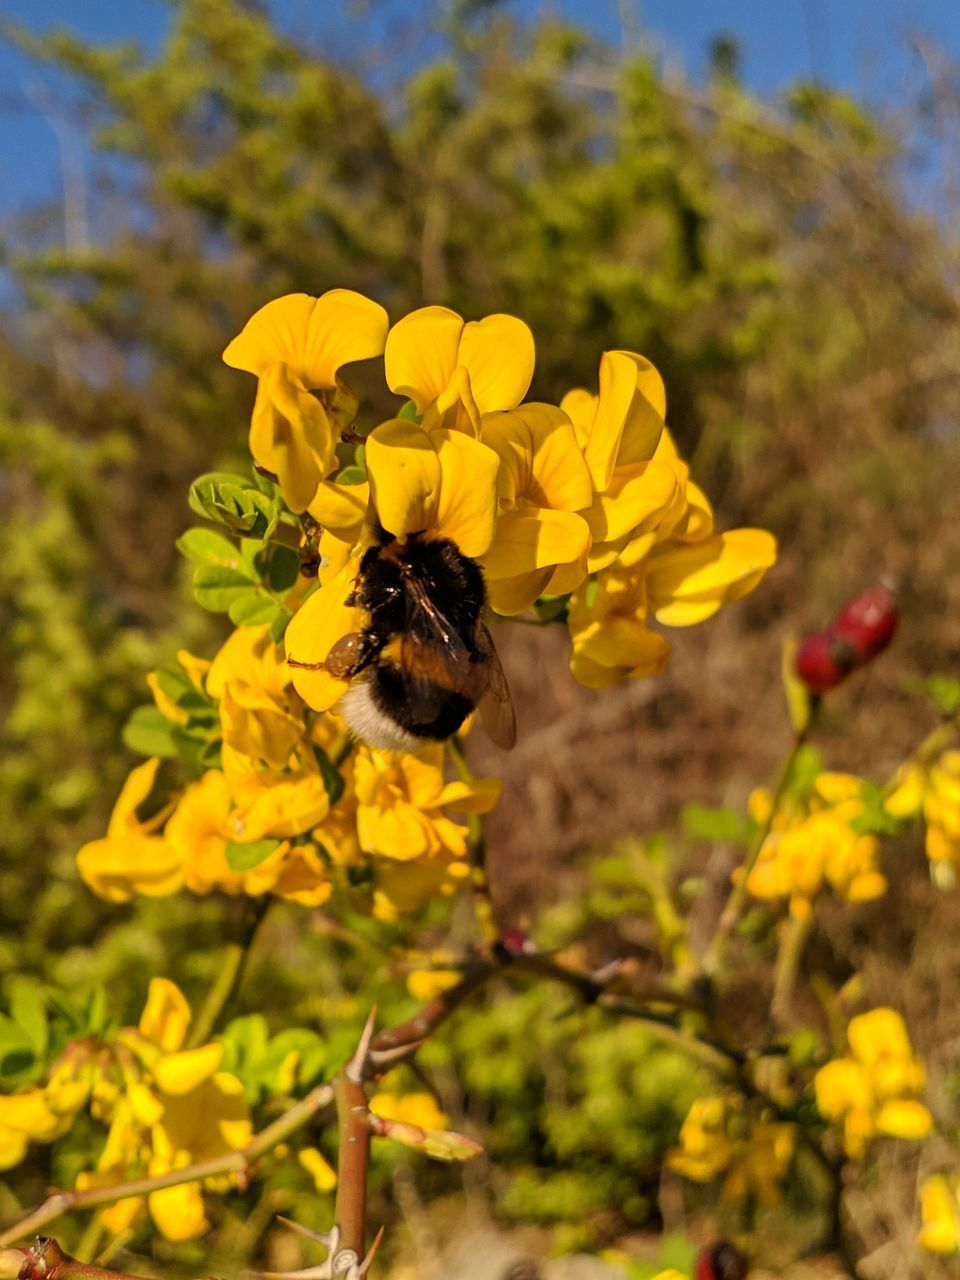 HONEY BEE POLLINATING ON YELLOW FLOWER